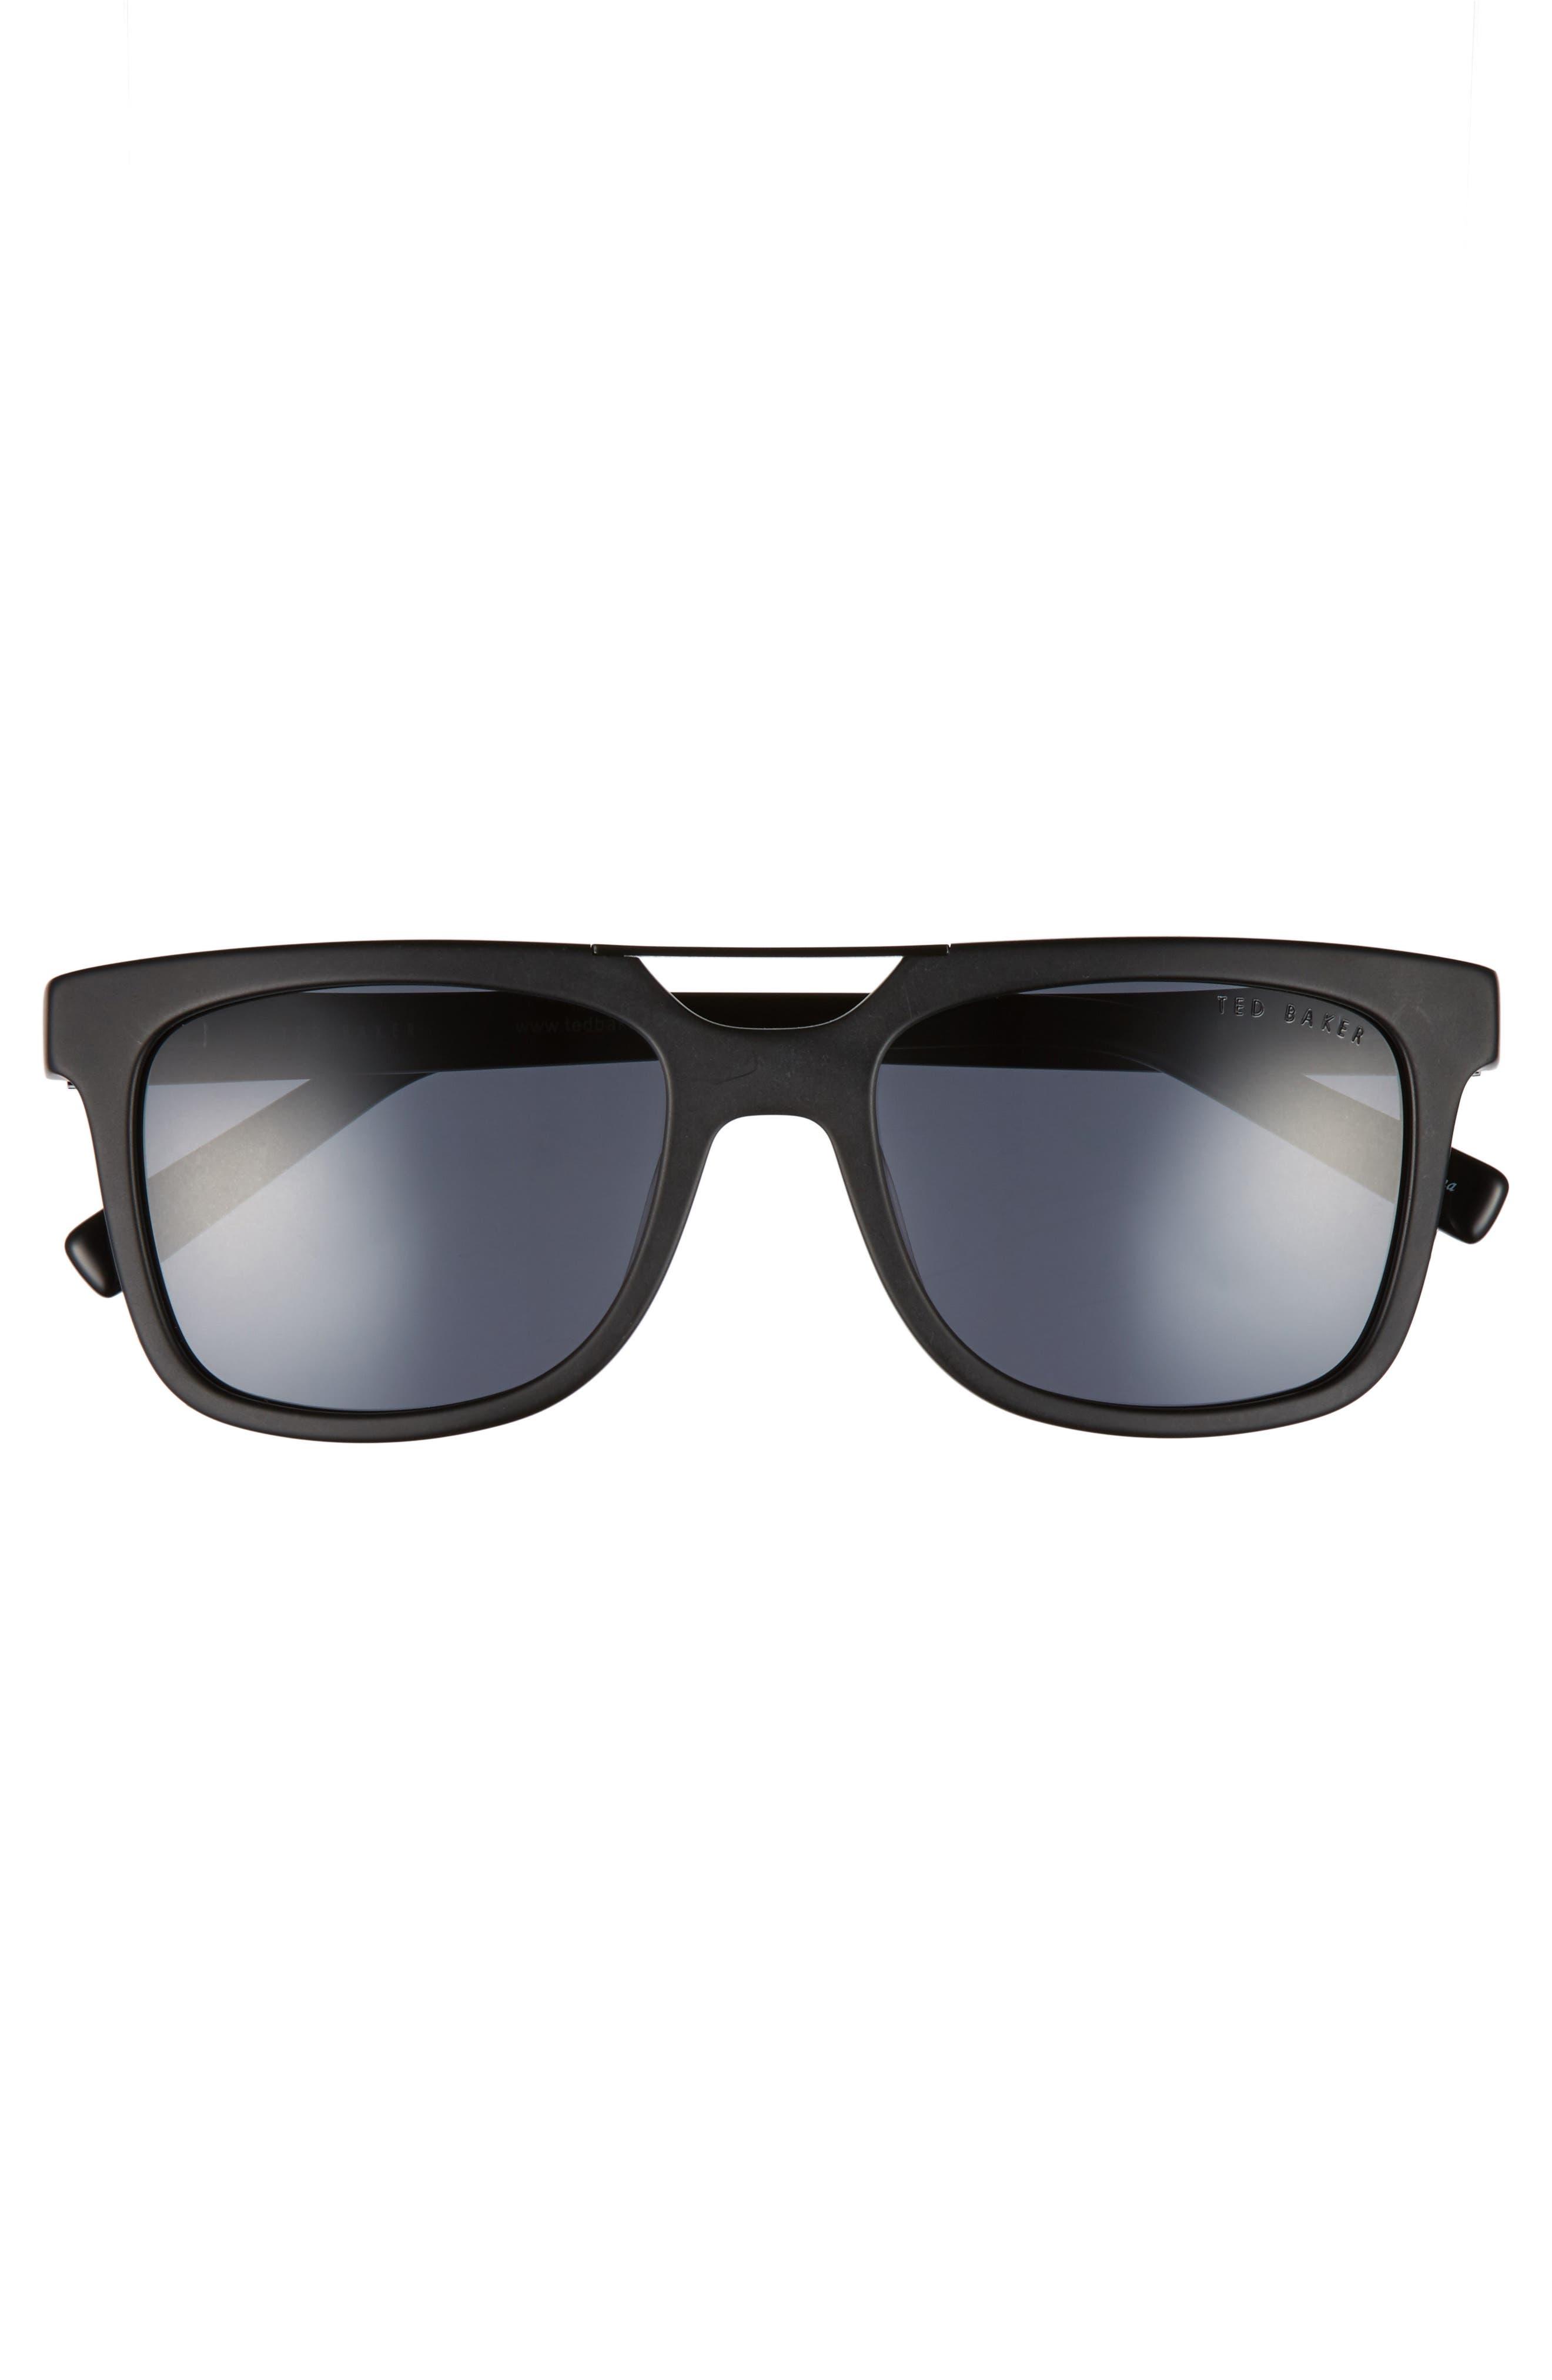 54mm Polarized Sunglasses,                             Alternate thumbnail 2, color,                             001